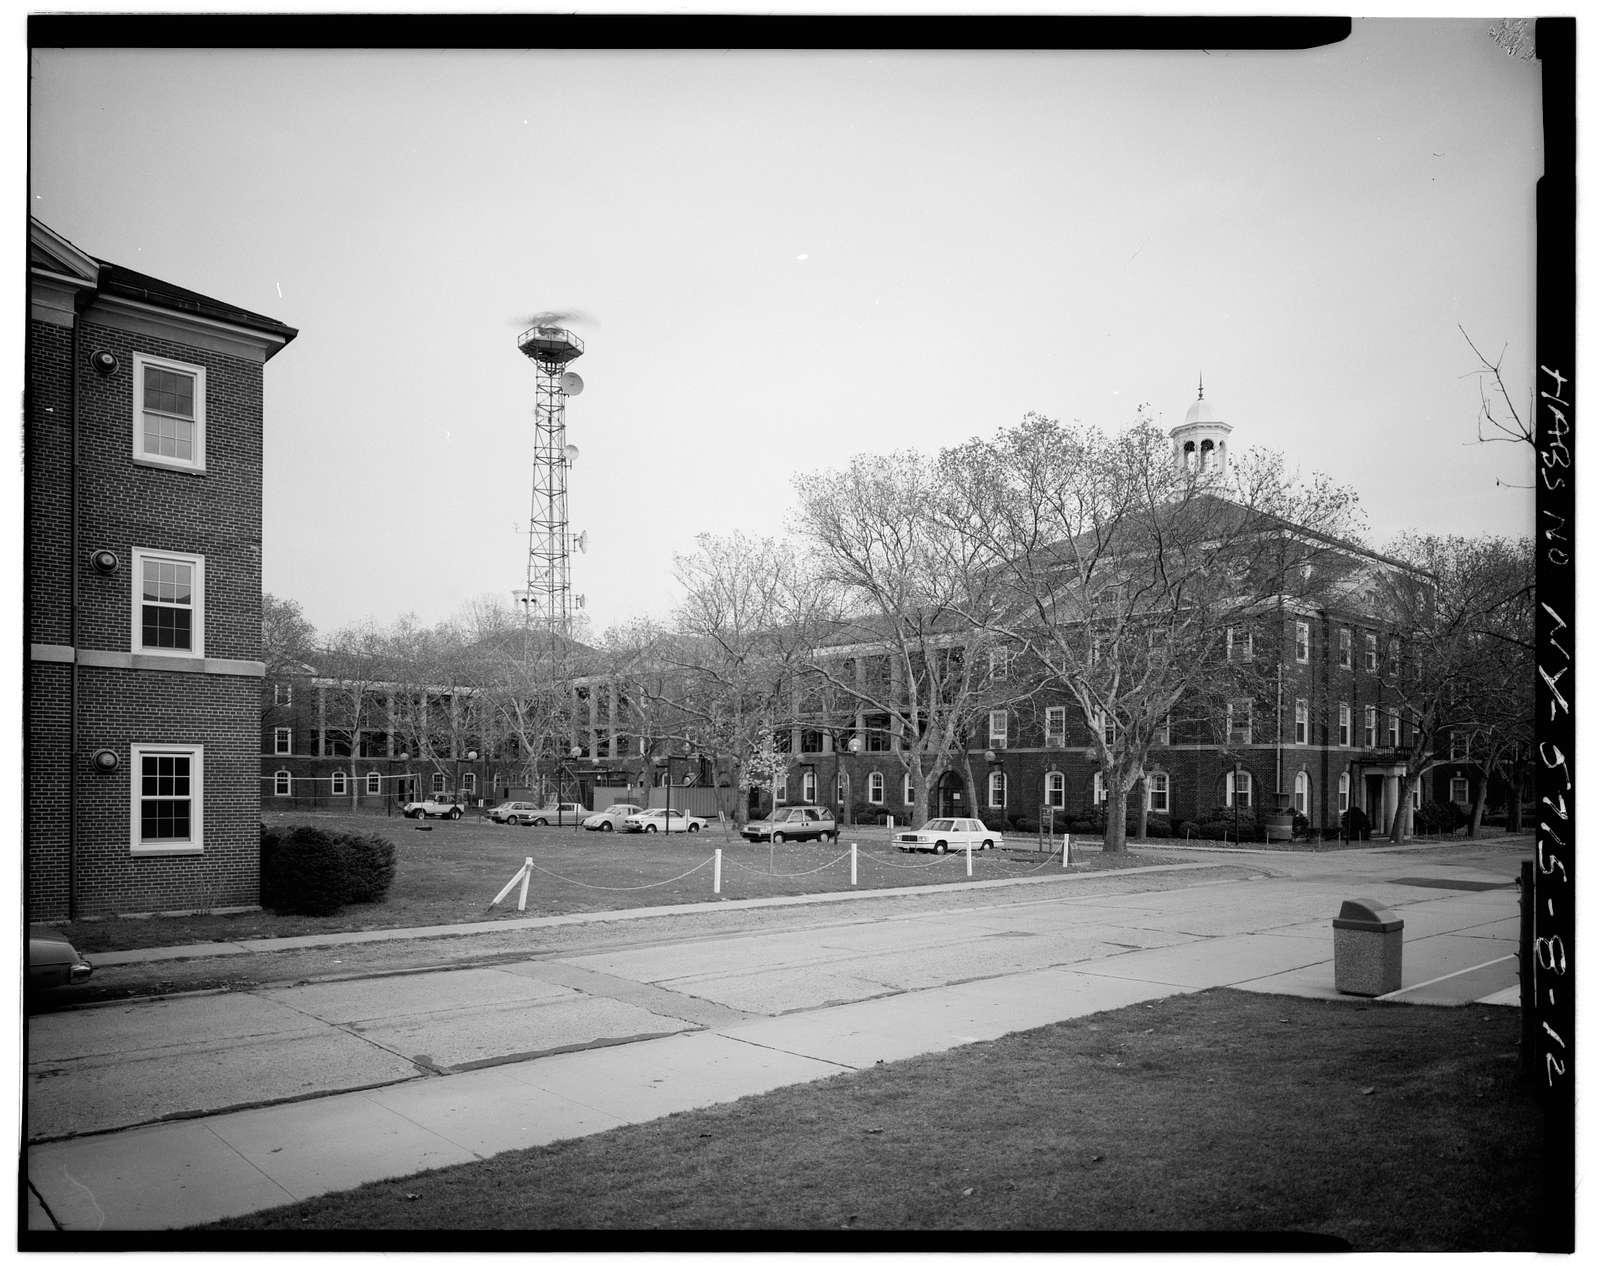 Governors Island, Infantry Regimental Barracks, New York Harbor, Clayton Road between Wheeler & King, New York, New York County, NY